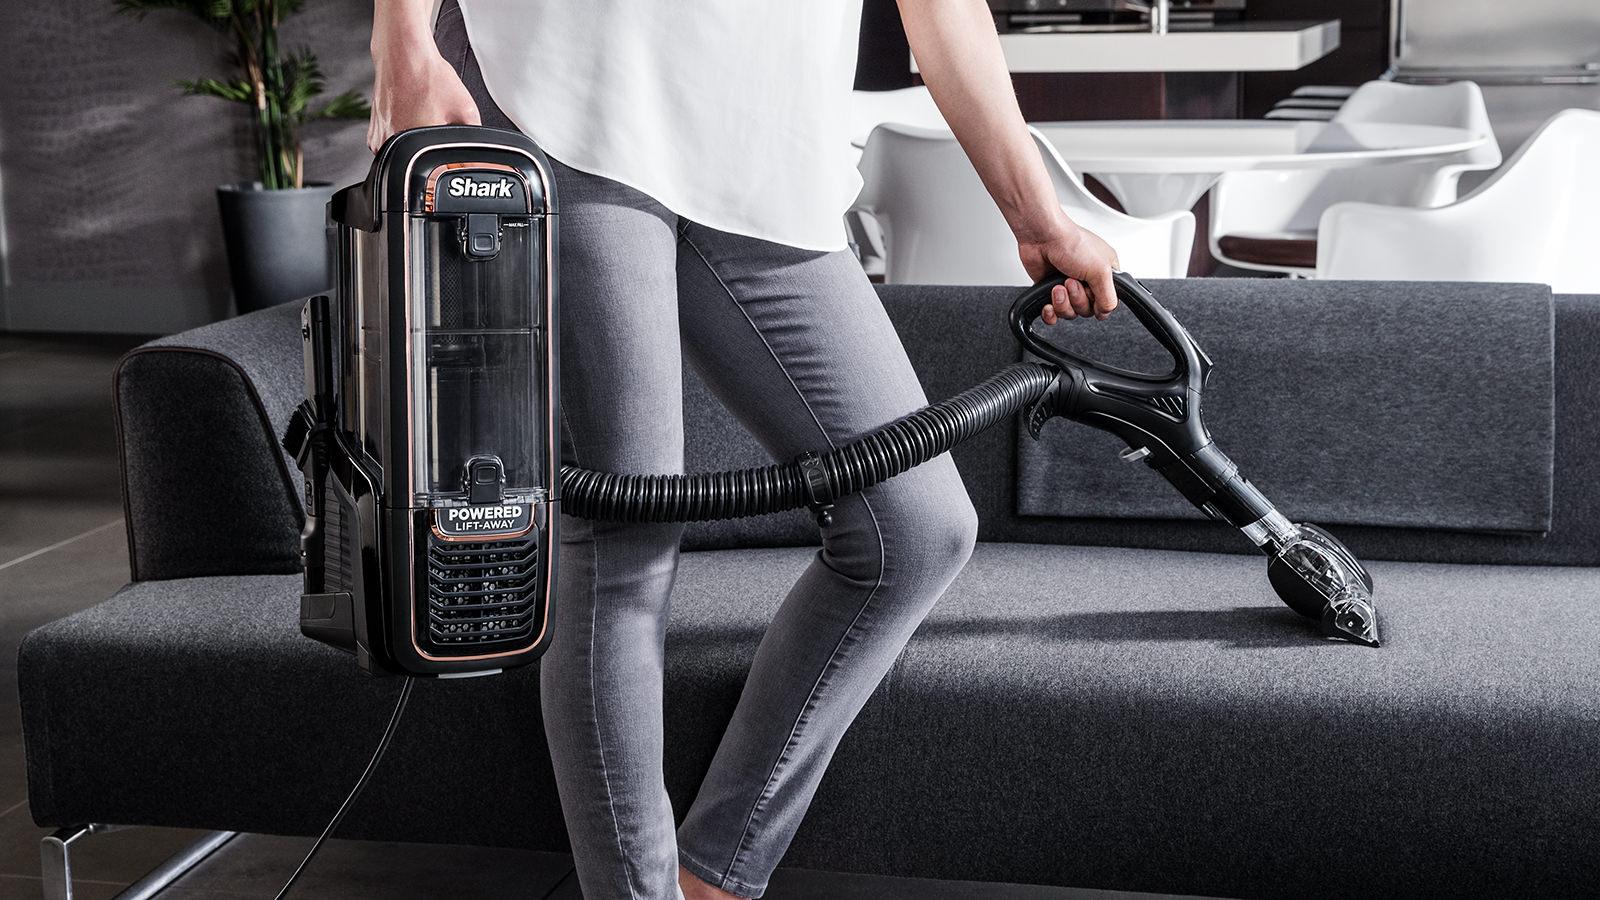 Shark Duoclean Powered Lift Away Xl Pet Vacuum Cleaner